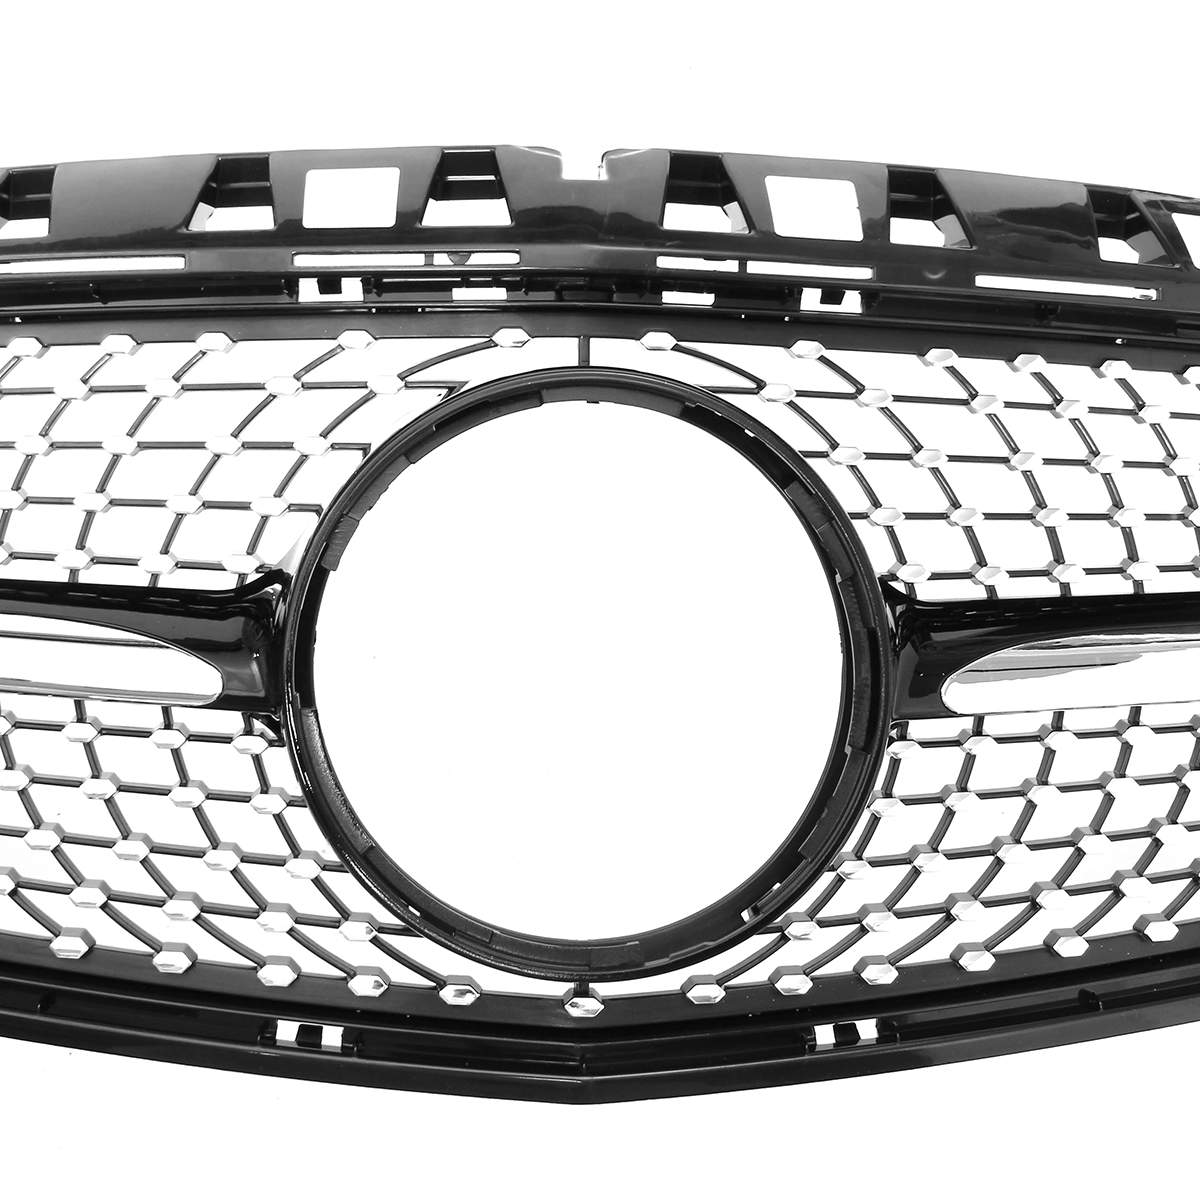 W176 A200 A250 Алмазный гриль сетка Стиль автомобиля Передняя решетка гриль для Mercedes Benz W176 A200 A250 A45 Для AMG 2013 2014 2015 - 5